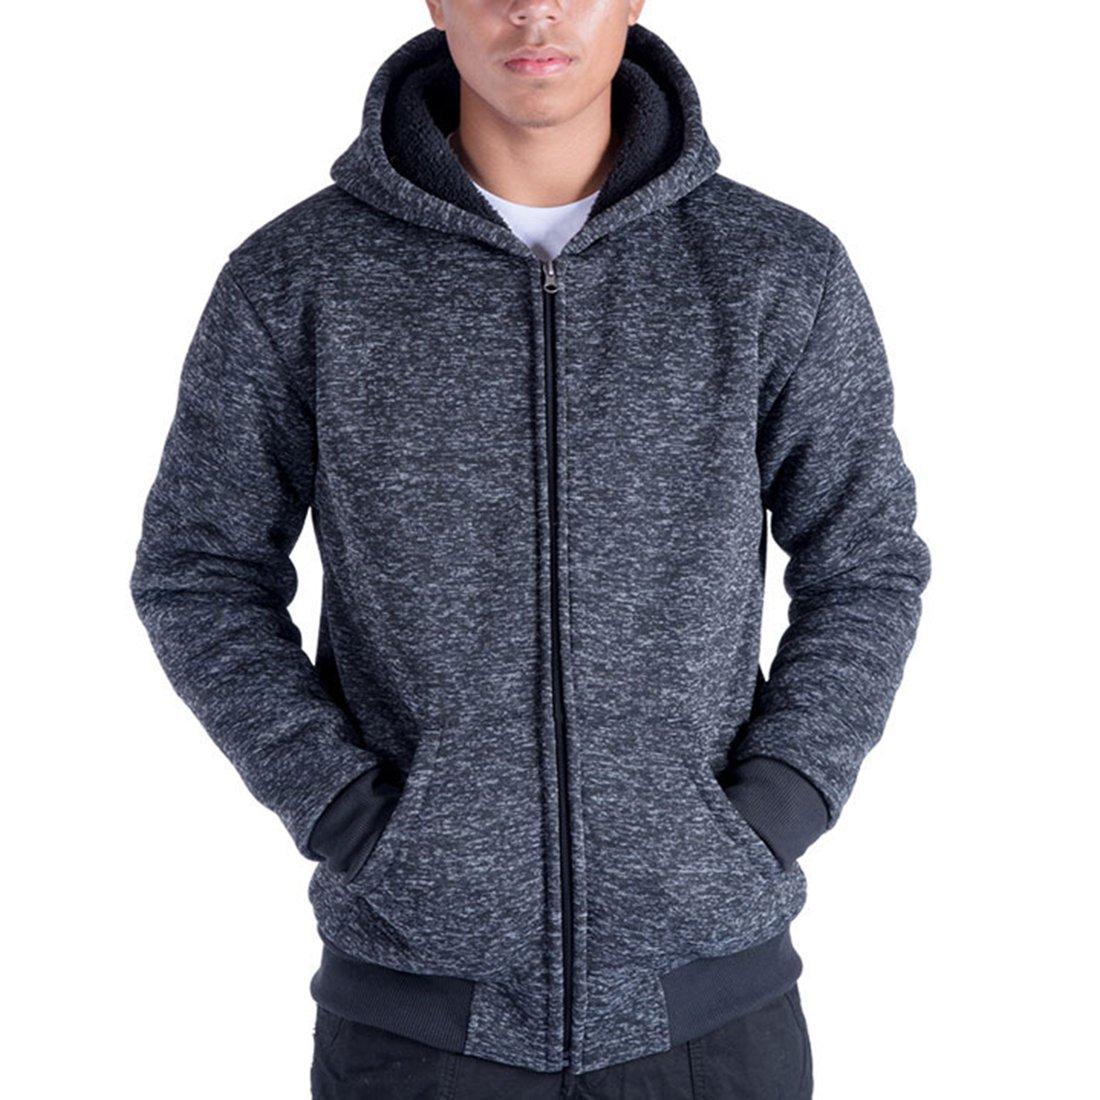 Gary Com Marled Heavyweight Sherpa Lined Fleece Hoodies for Men Full-Zip Plus Size 5XL Men's Sweatshirts Jackets (M, Dark Blue)